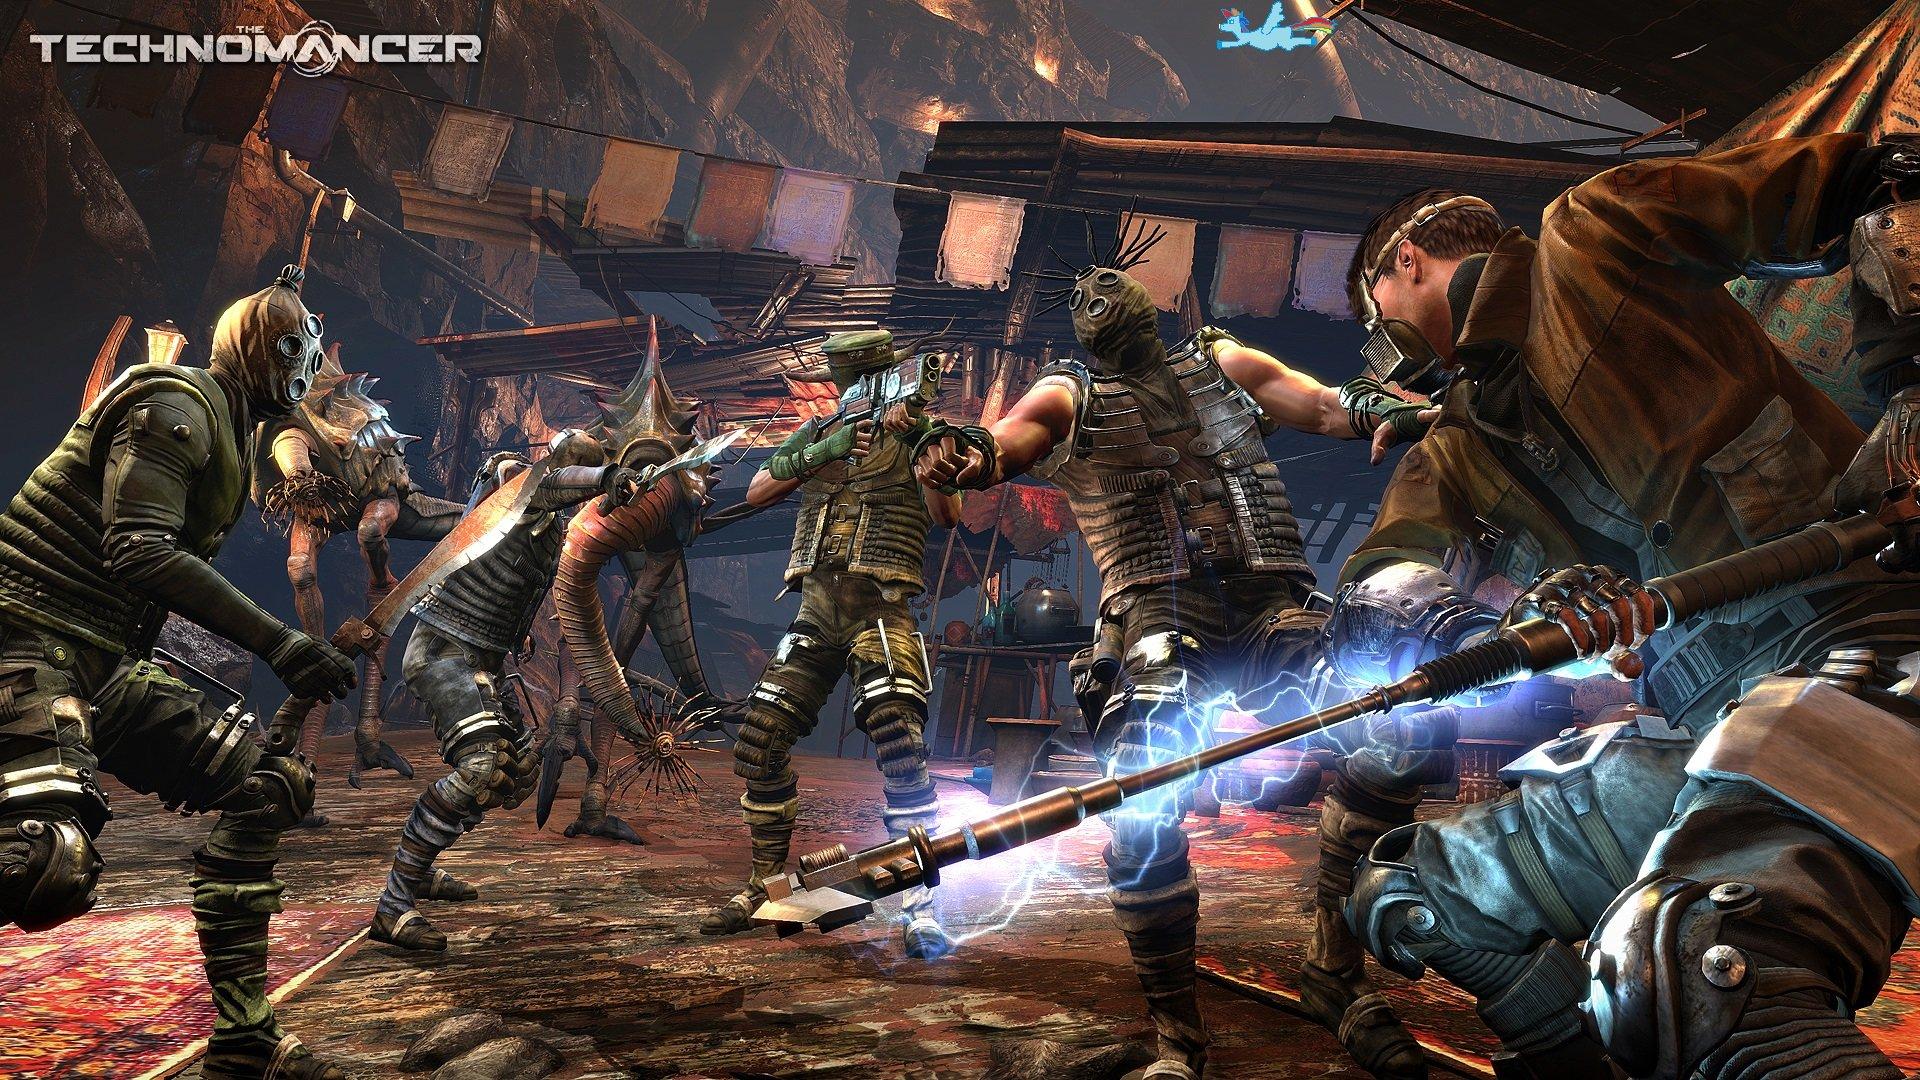 The Technomancer Screenshots ~ PS4, Xbox One & PC - Изображение 3